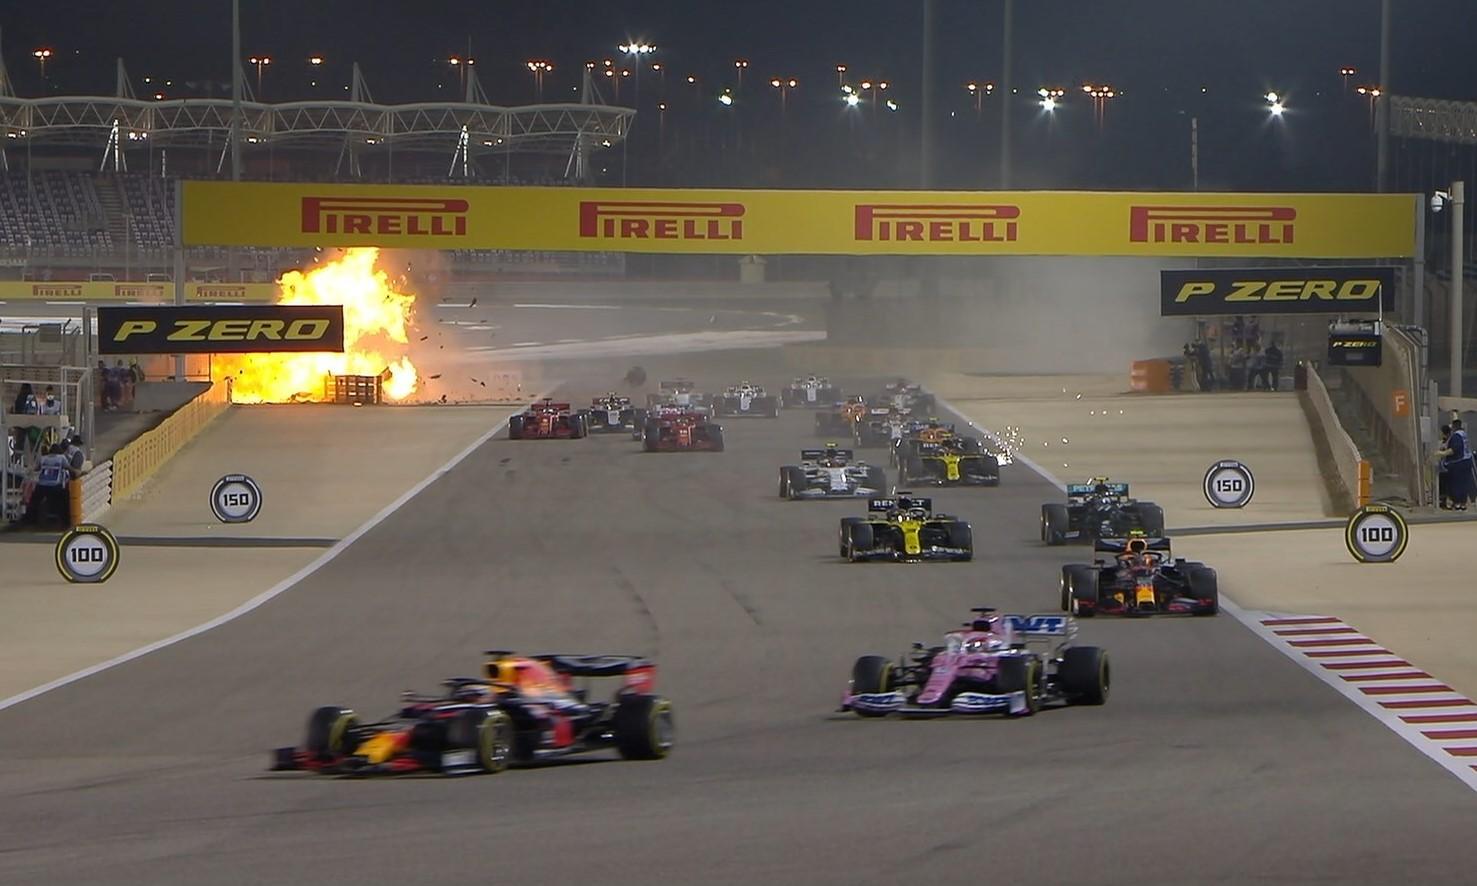 F1 Review Bahrain 2020 Romain Grosjean crash (Image F1 via facebook)